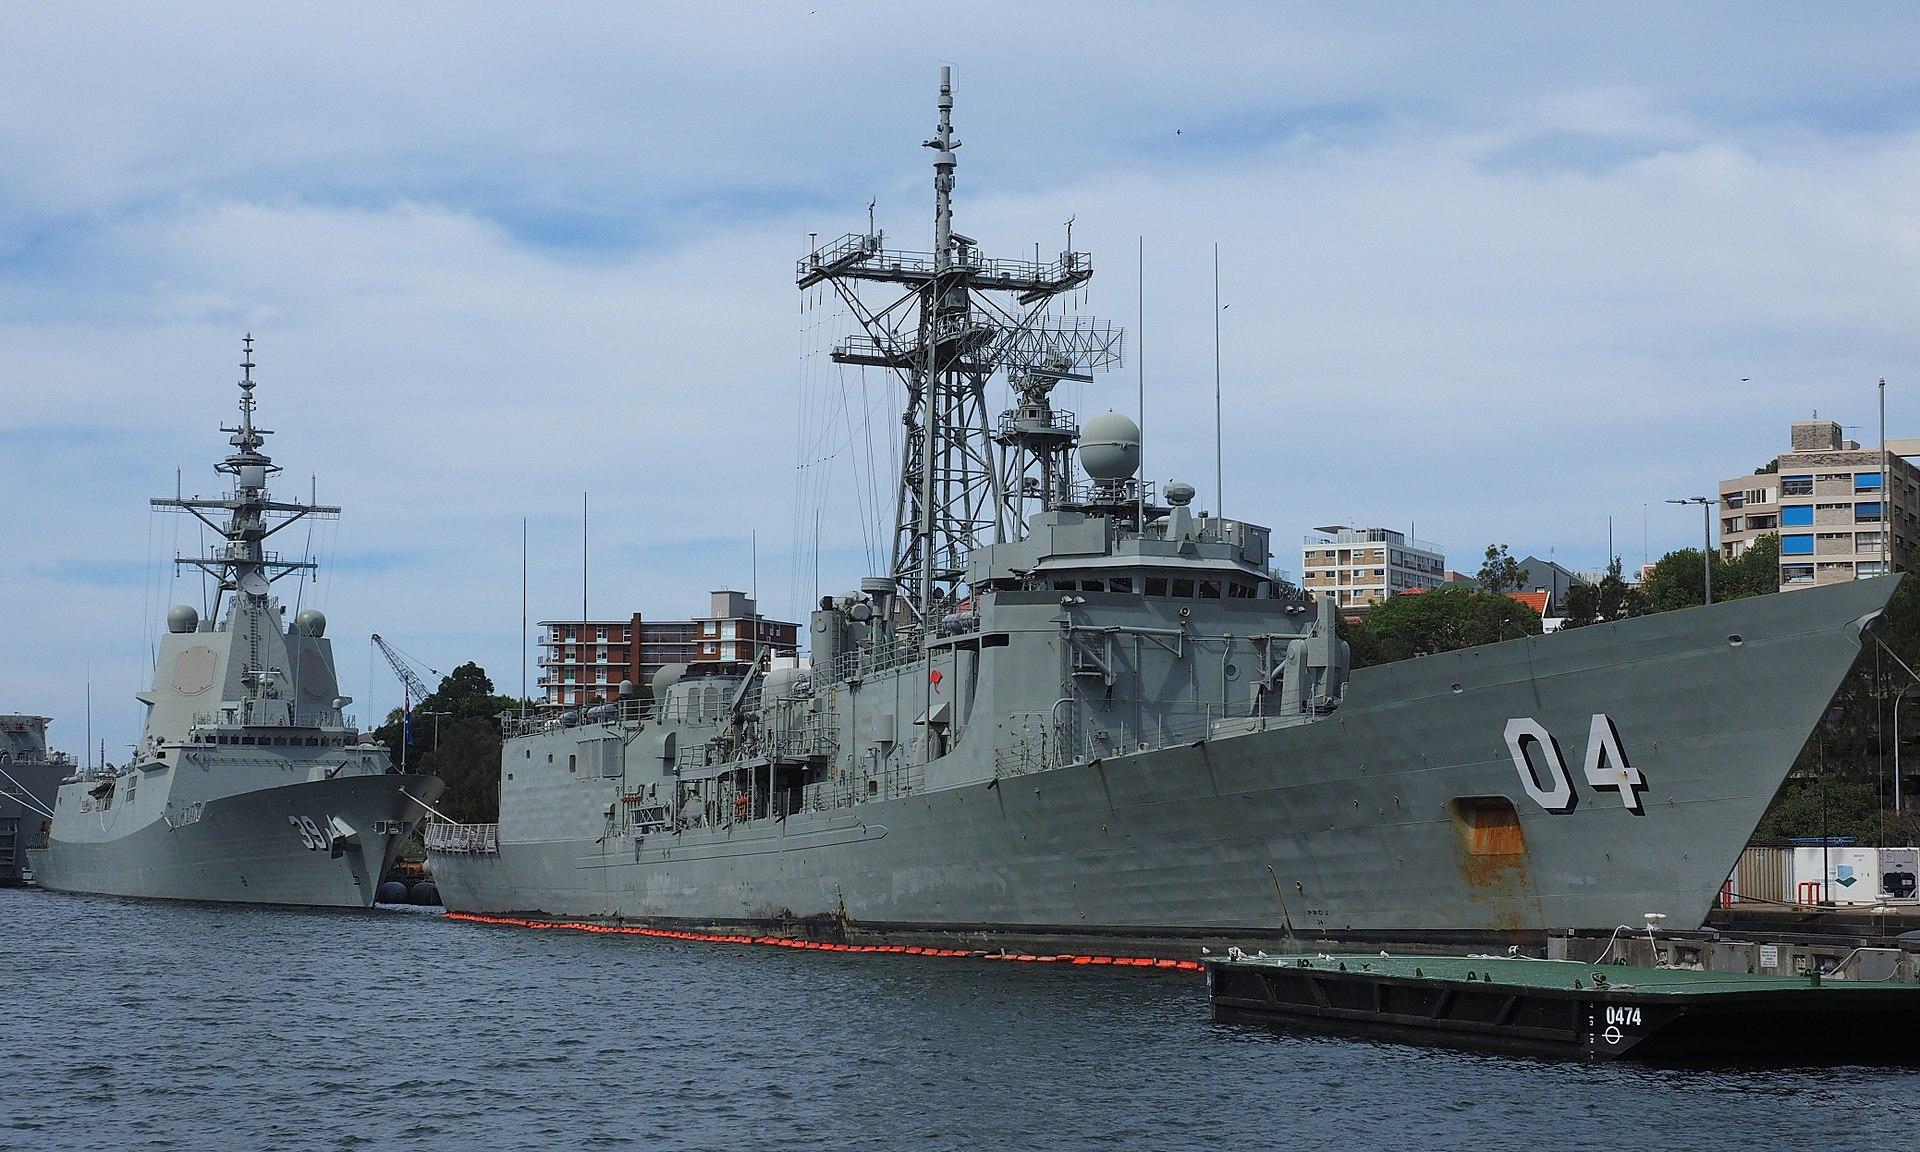 https://upload.wikimedia.org/wikipedia/commons/thumb/8/81/HMAS_Hobart_and_the_former_HMAS_Darwin_December_2017.jpg/1920px-HMAS_Hobart_and_the_former_HMAS_Darwin_December_2017.jpg